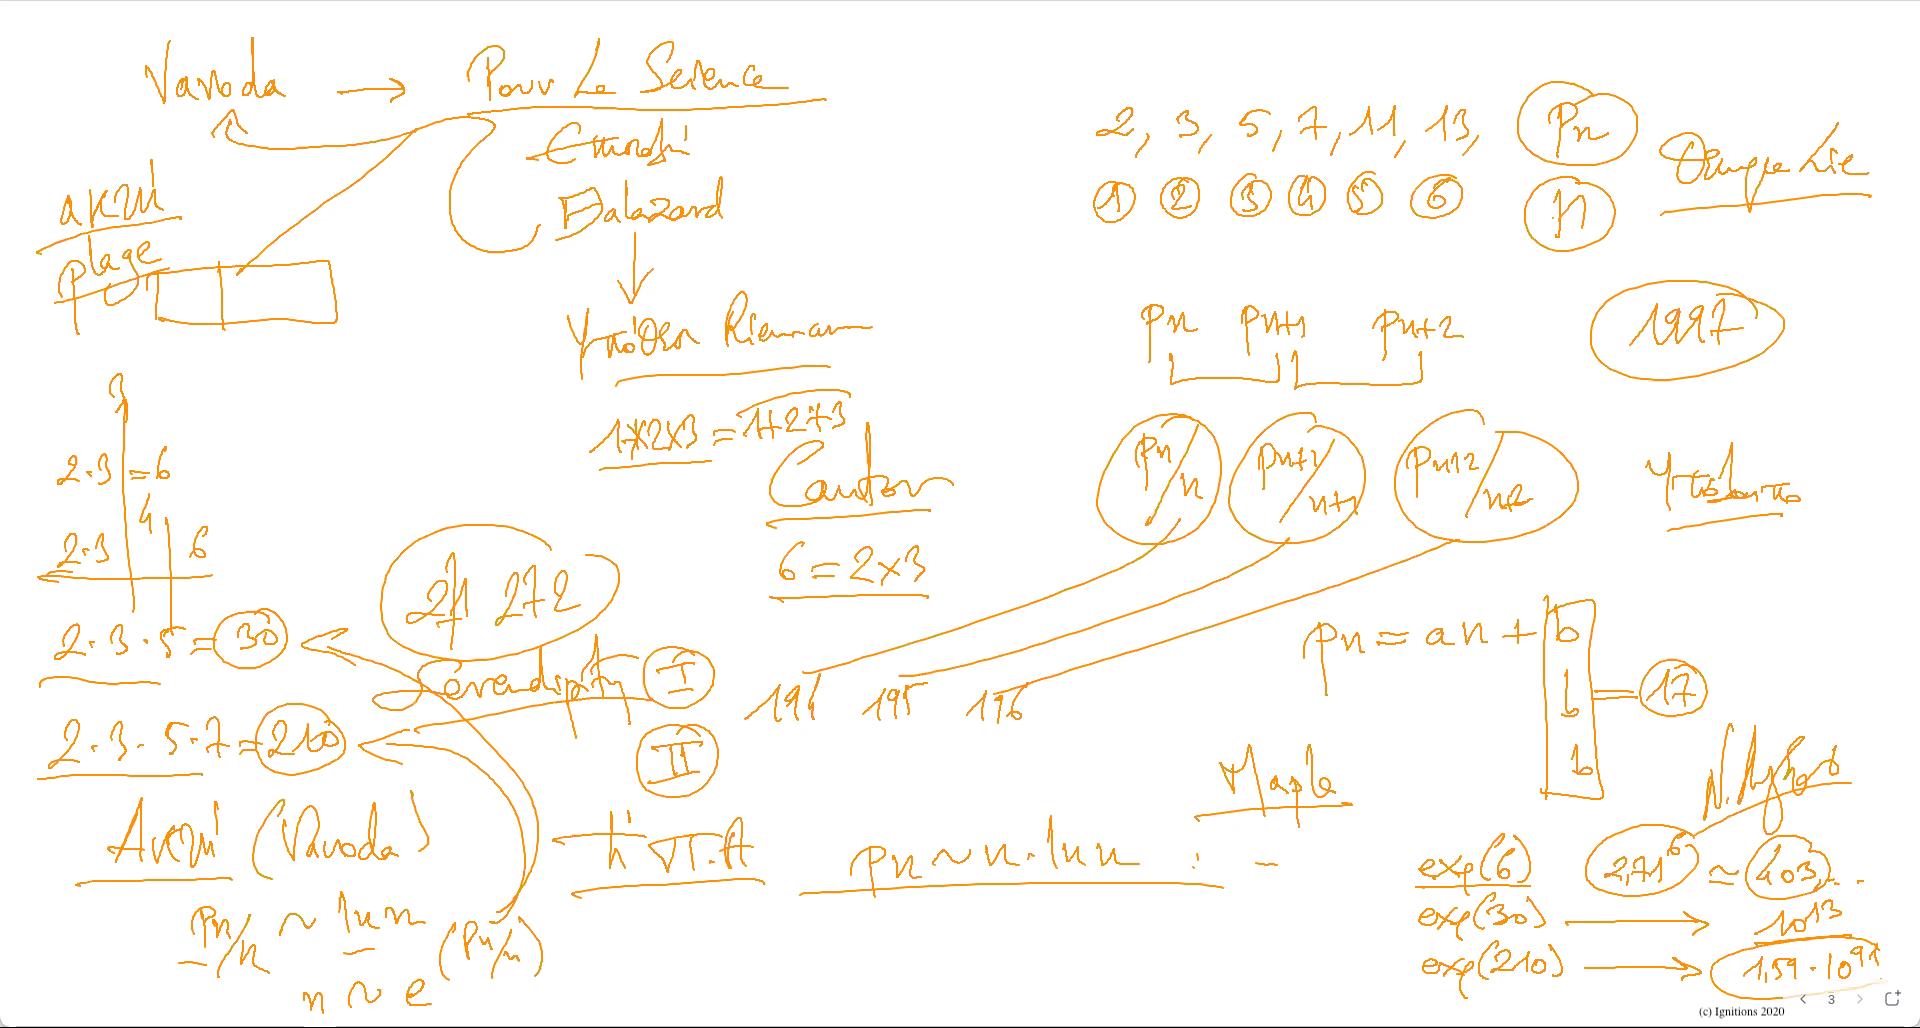 57299 - VIII - Το Μαθηματικό Έργο της Ανθρωπότητας. Έργο IX. (Dessin)